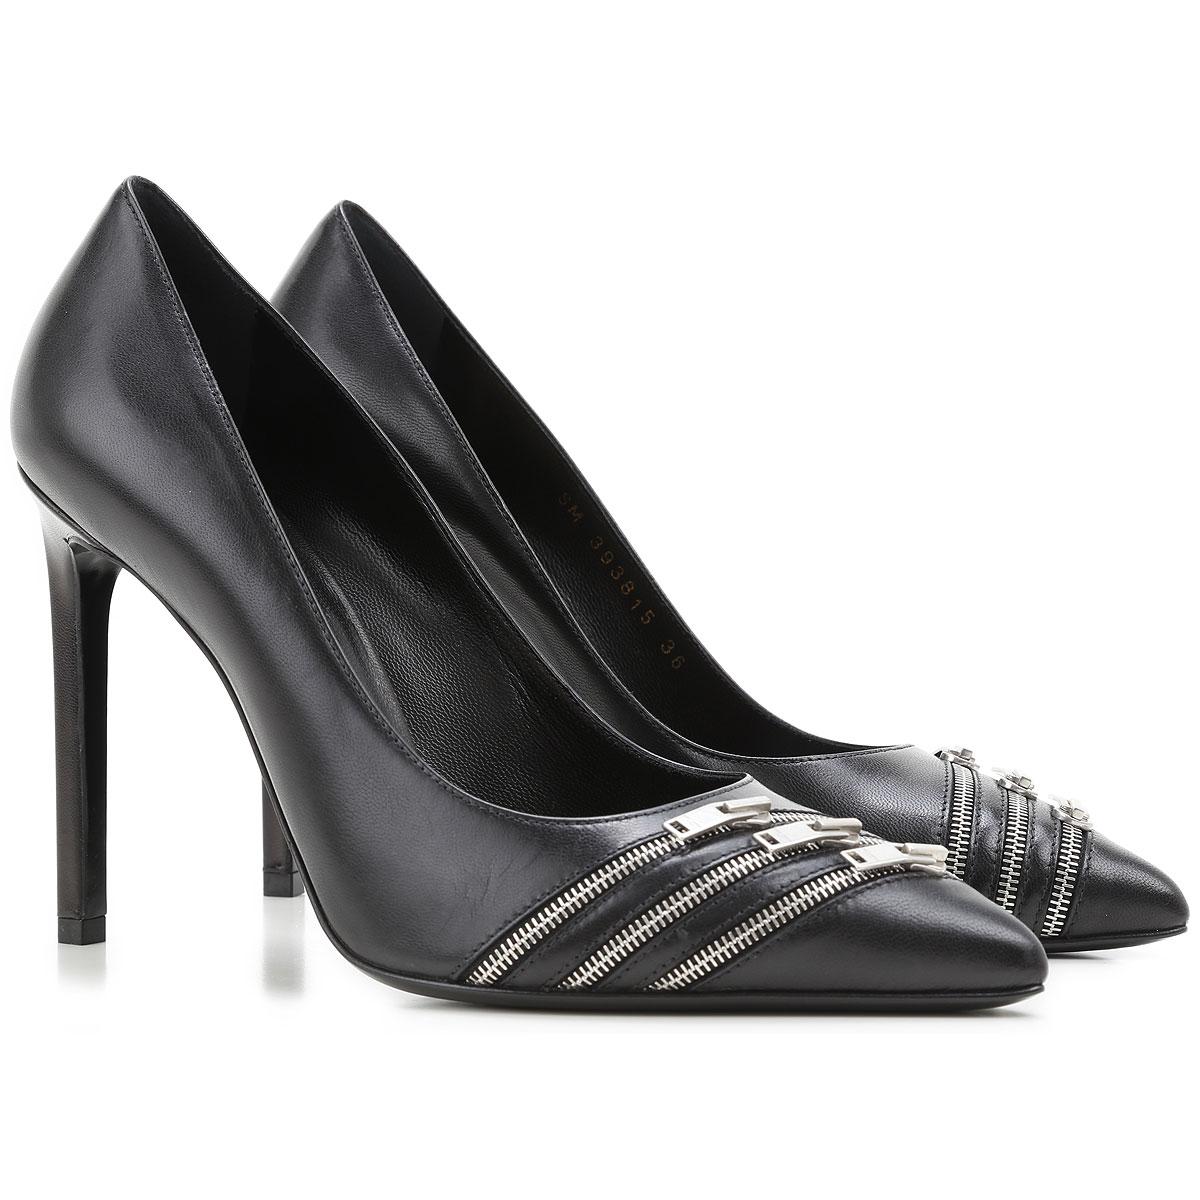 chaussures femme yves saint laurent code produit 393815 akp00 1000. Black Bedroom Furniture Sets. Home Design Ideas